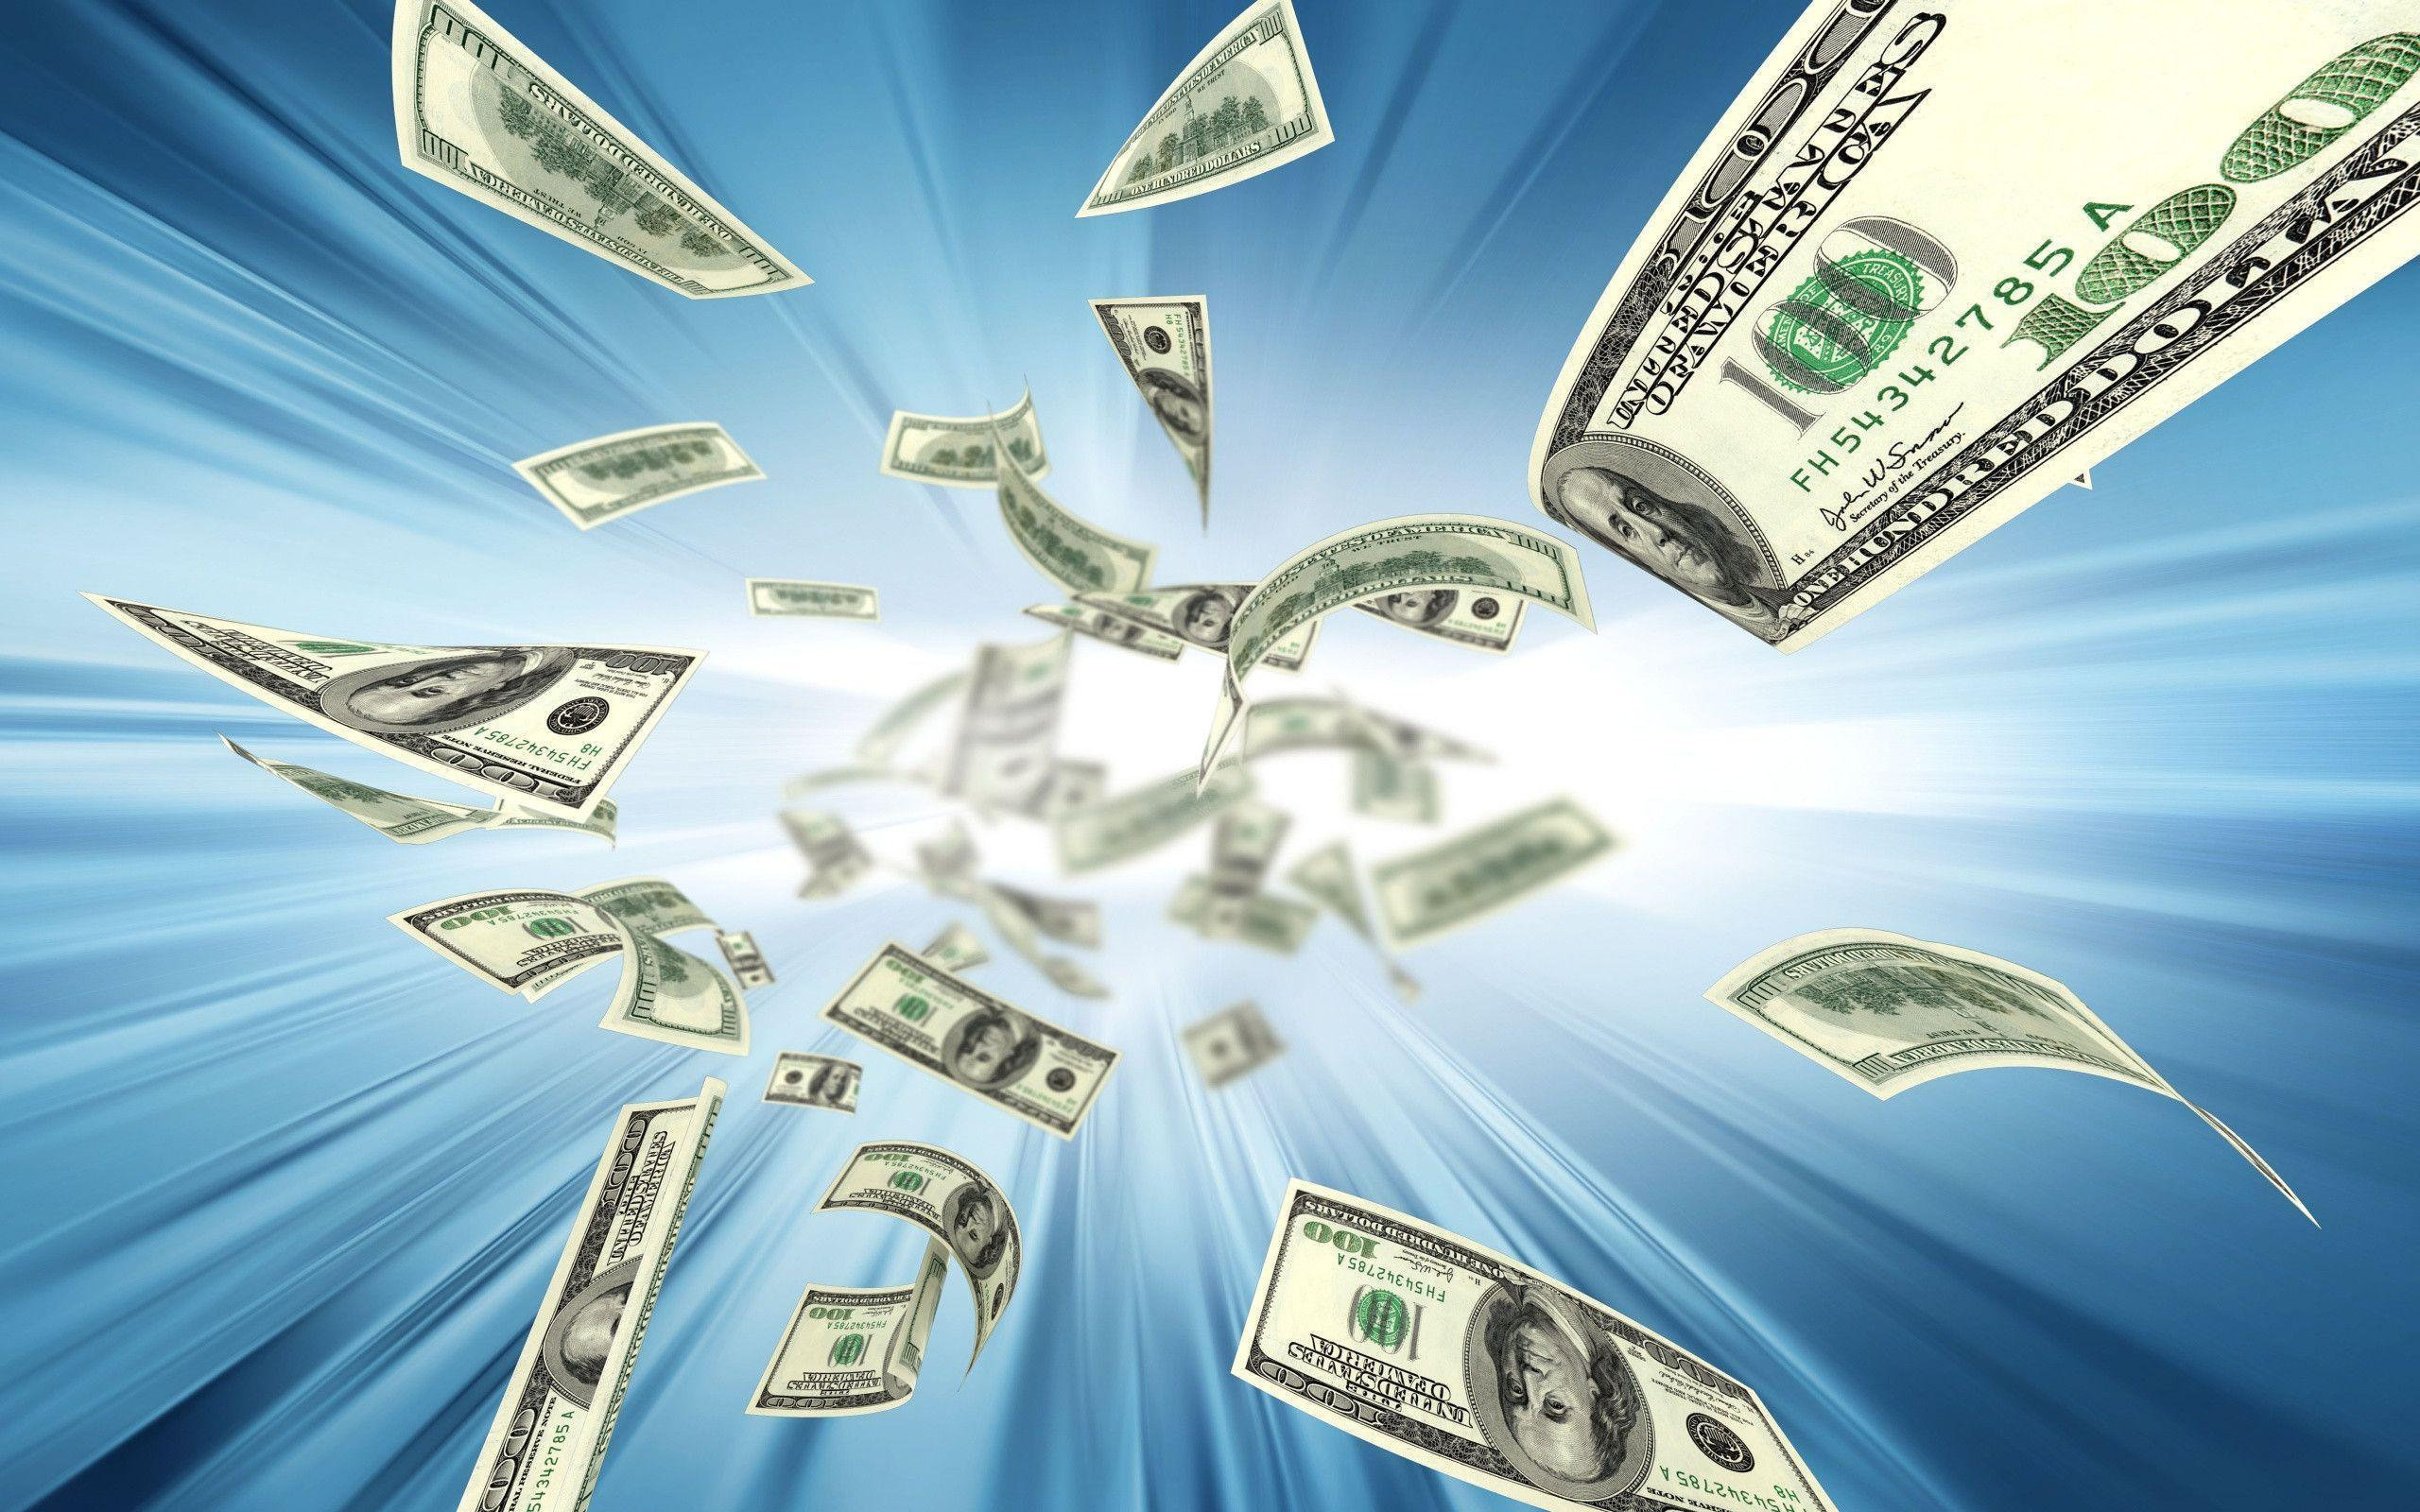 Money backgrounds wallpaper cave Got online hd